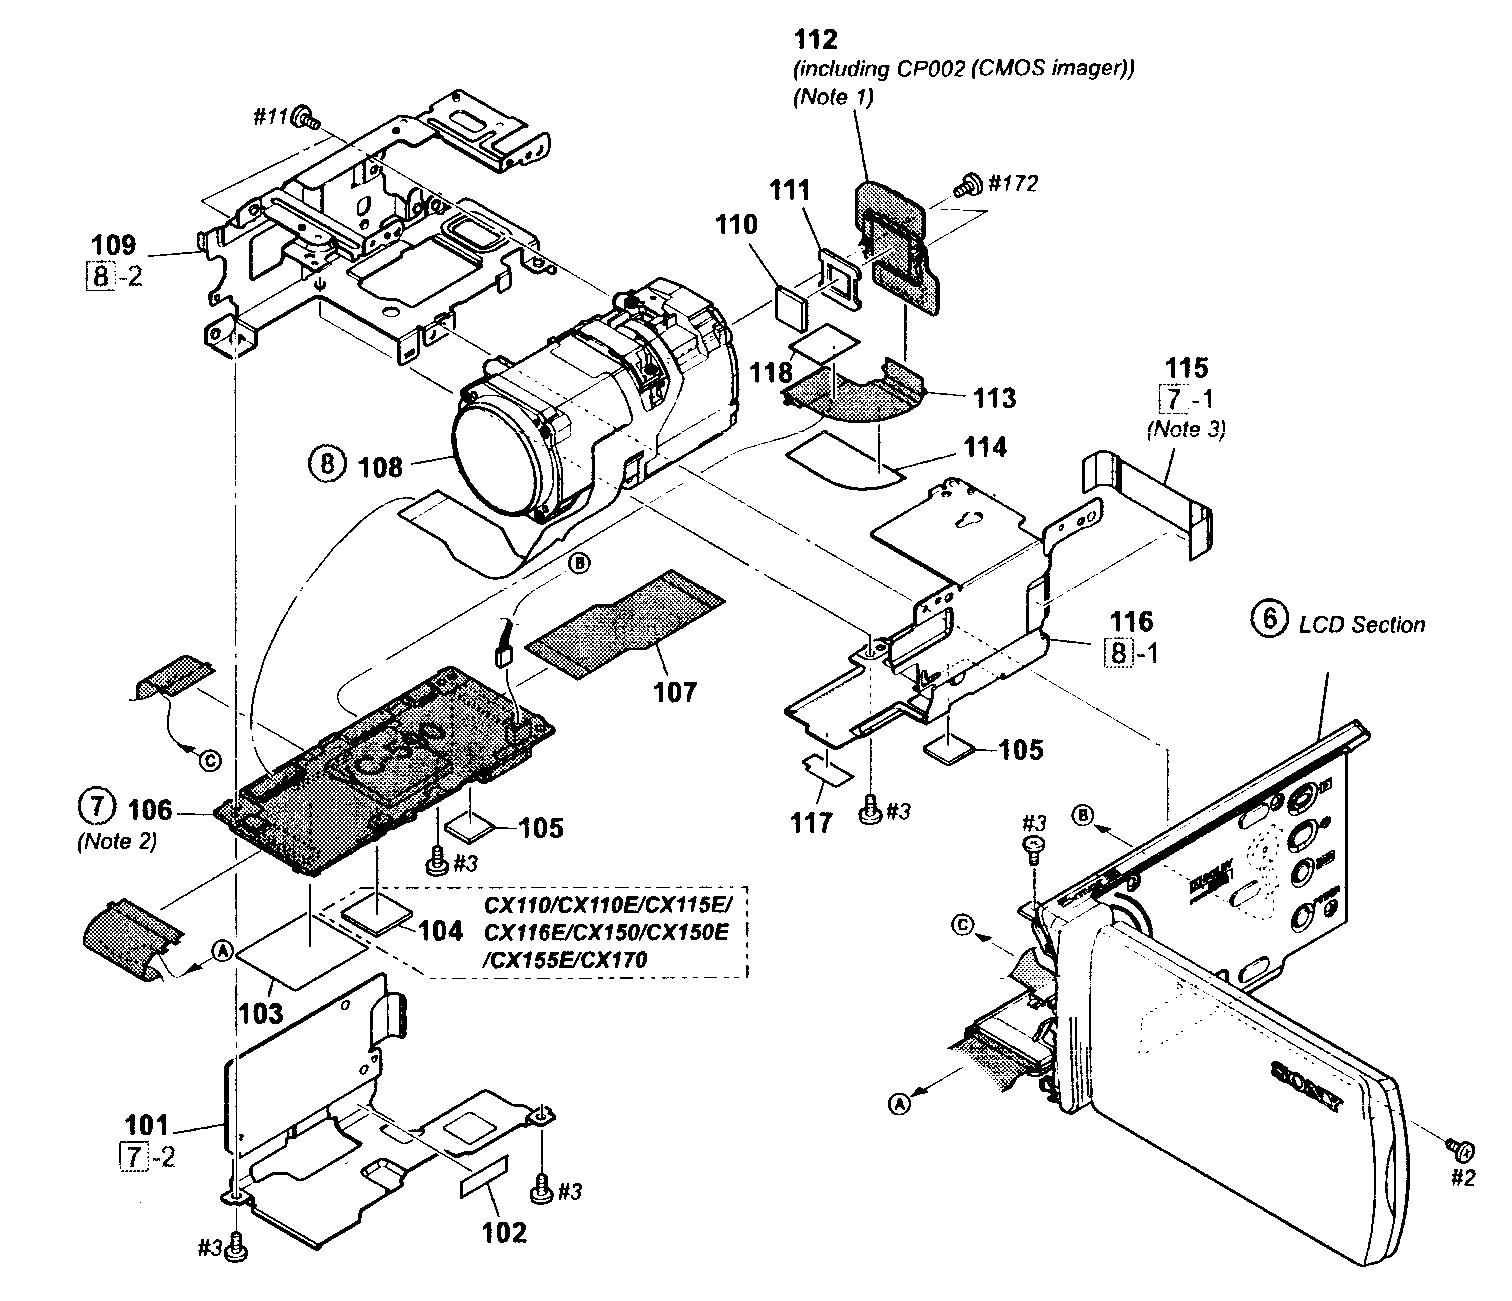 Sony model HDR-CX110 digital camcorder genuine parts